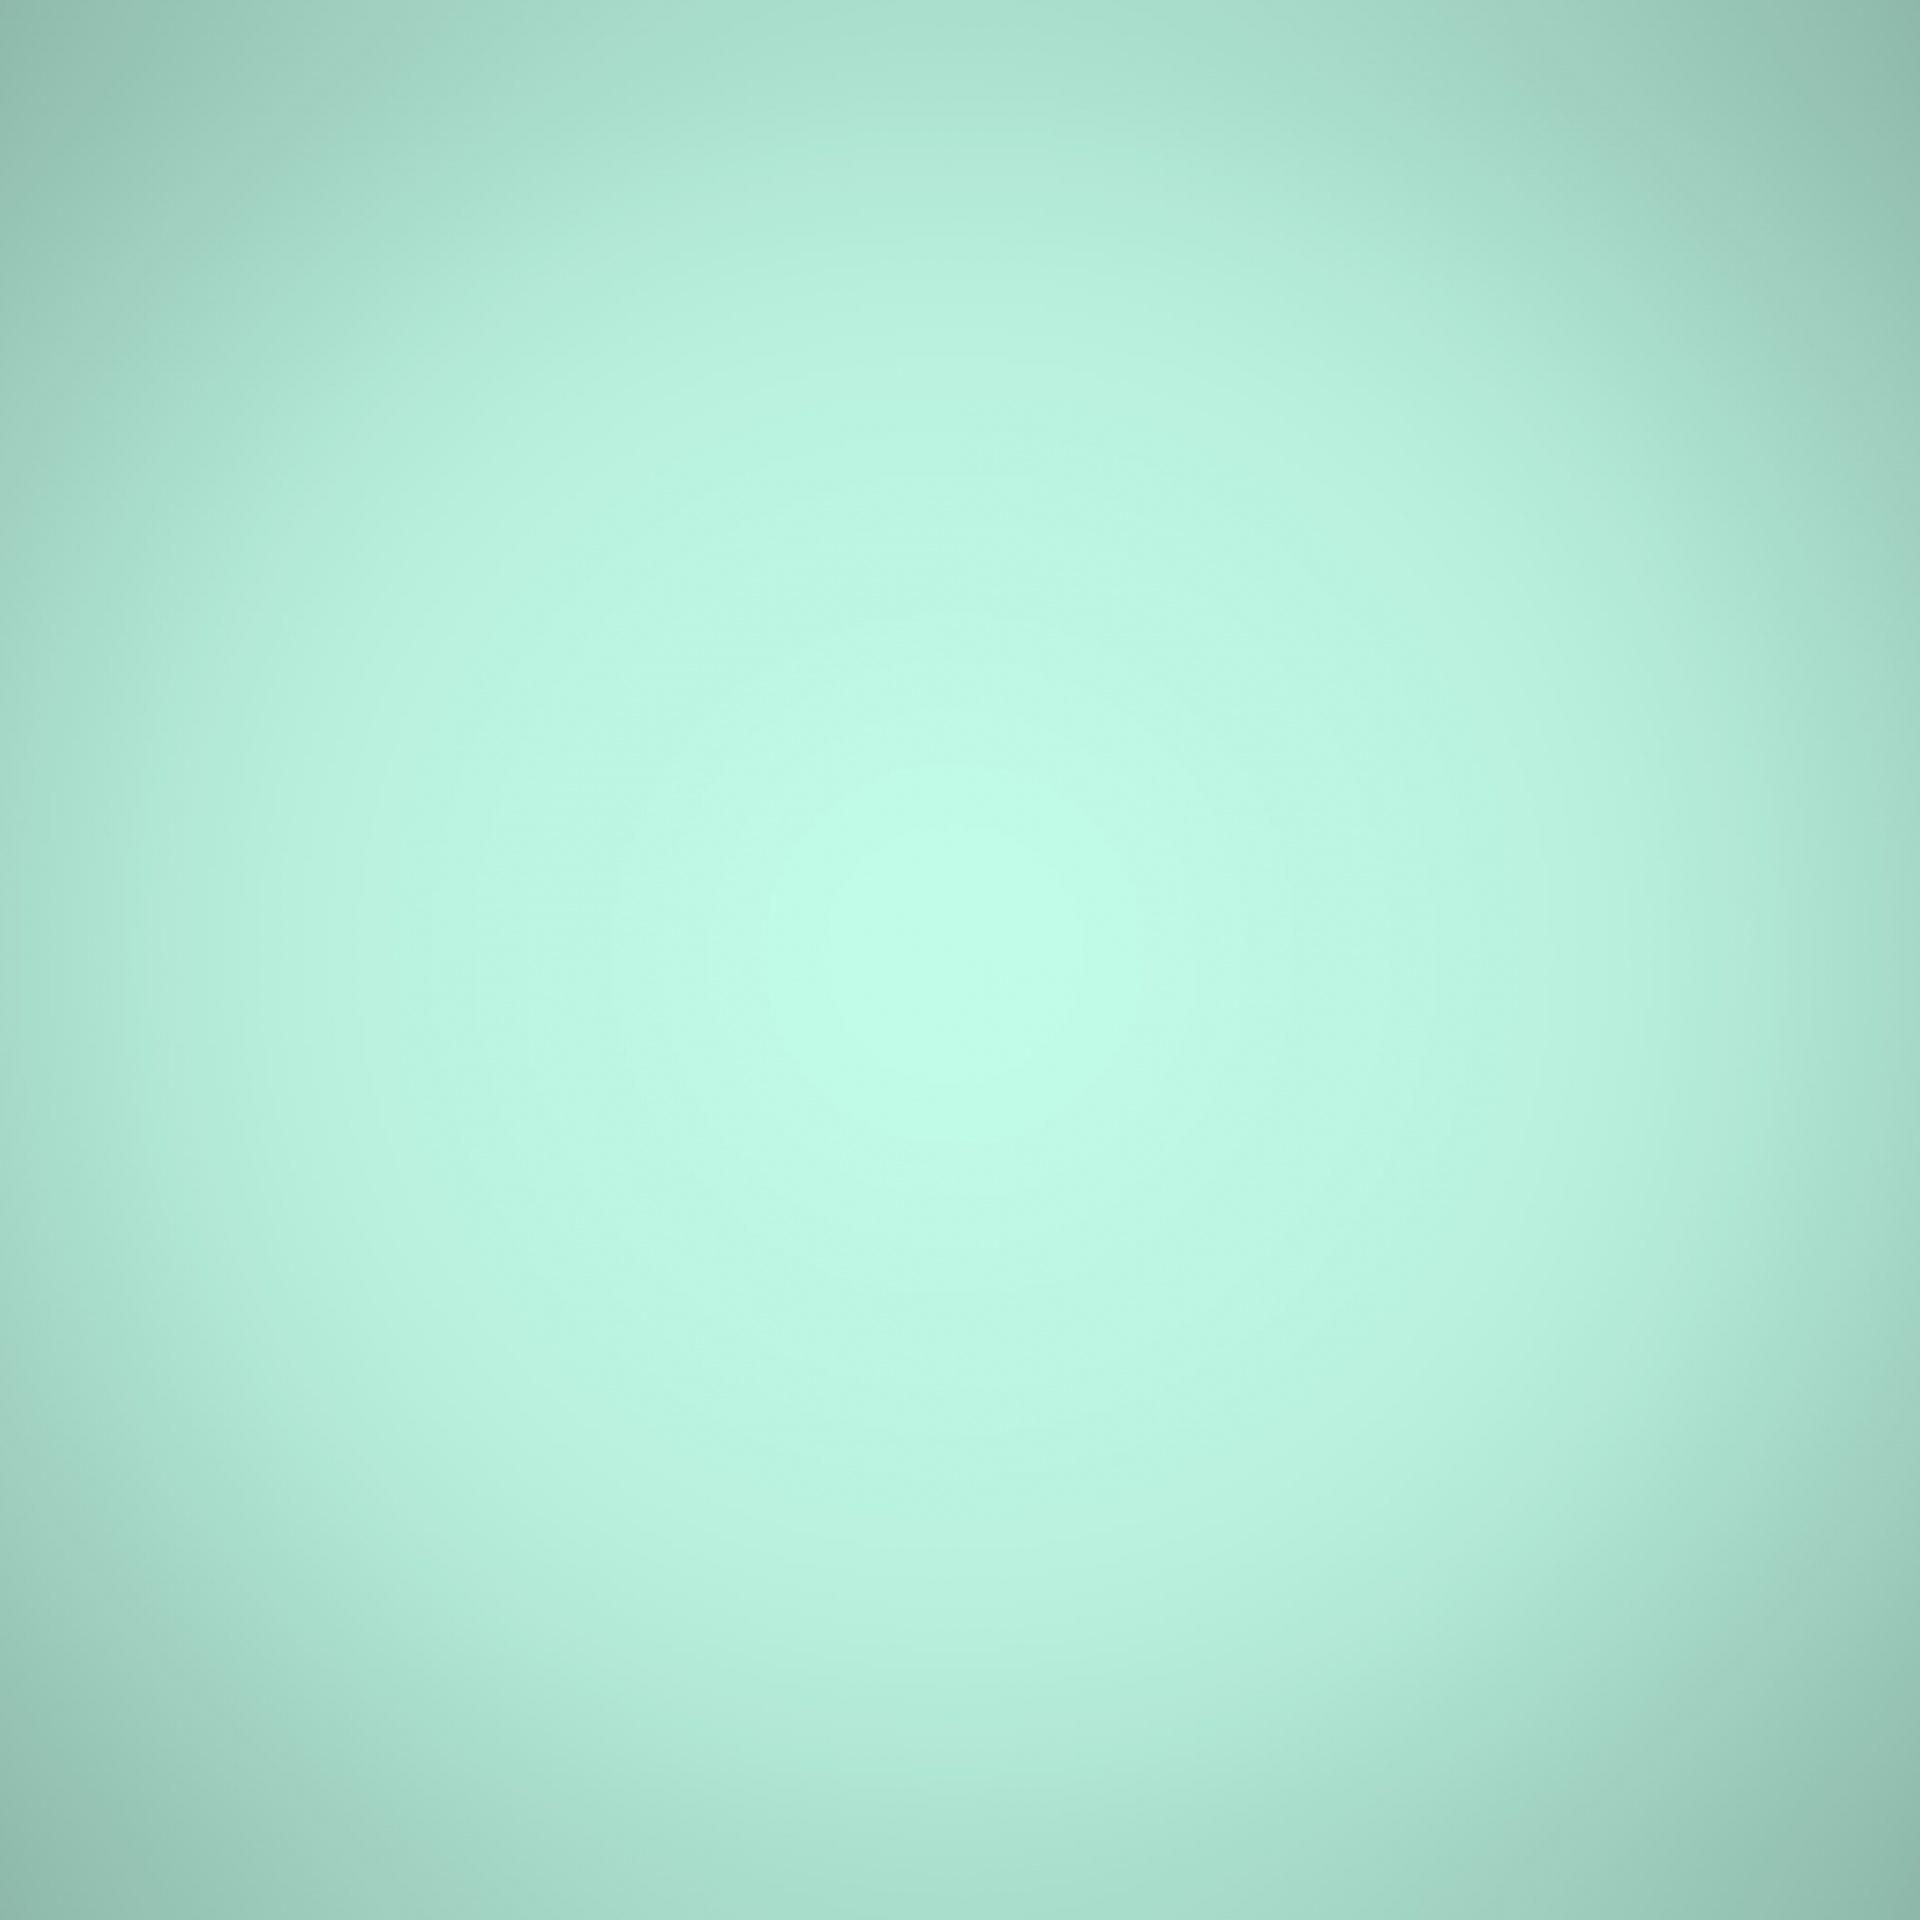 Wallpaperpastelgreenbackgroundcolor Free Image From